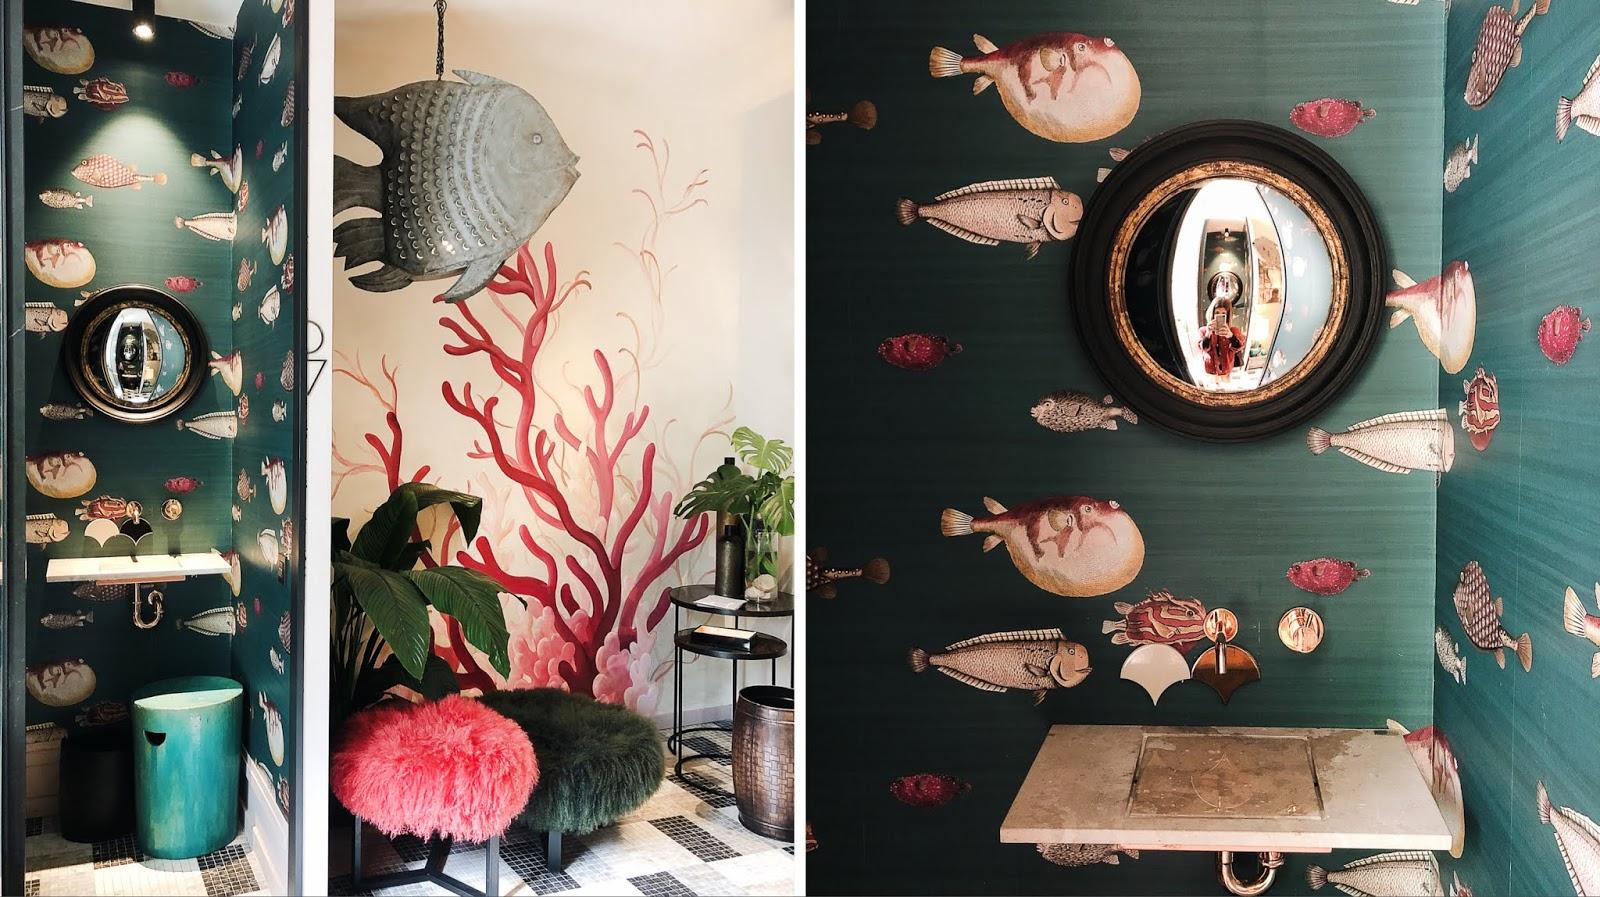 Miapetra, miapetra espana Interiorista español, interioristas en spana, Decoracion de interiores, decoracion de interiores espana, interior design spain, spain interior designers